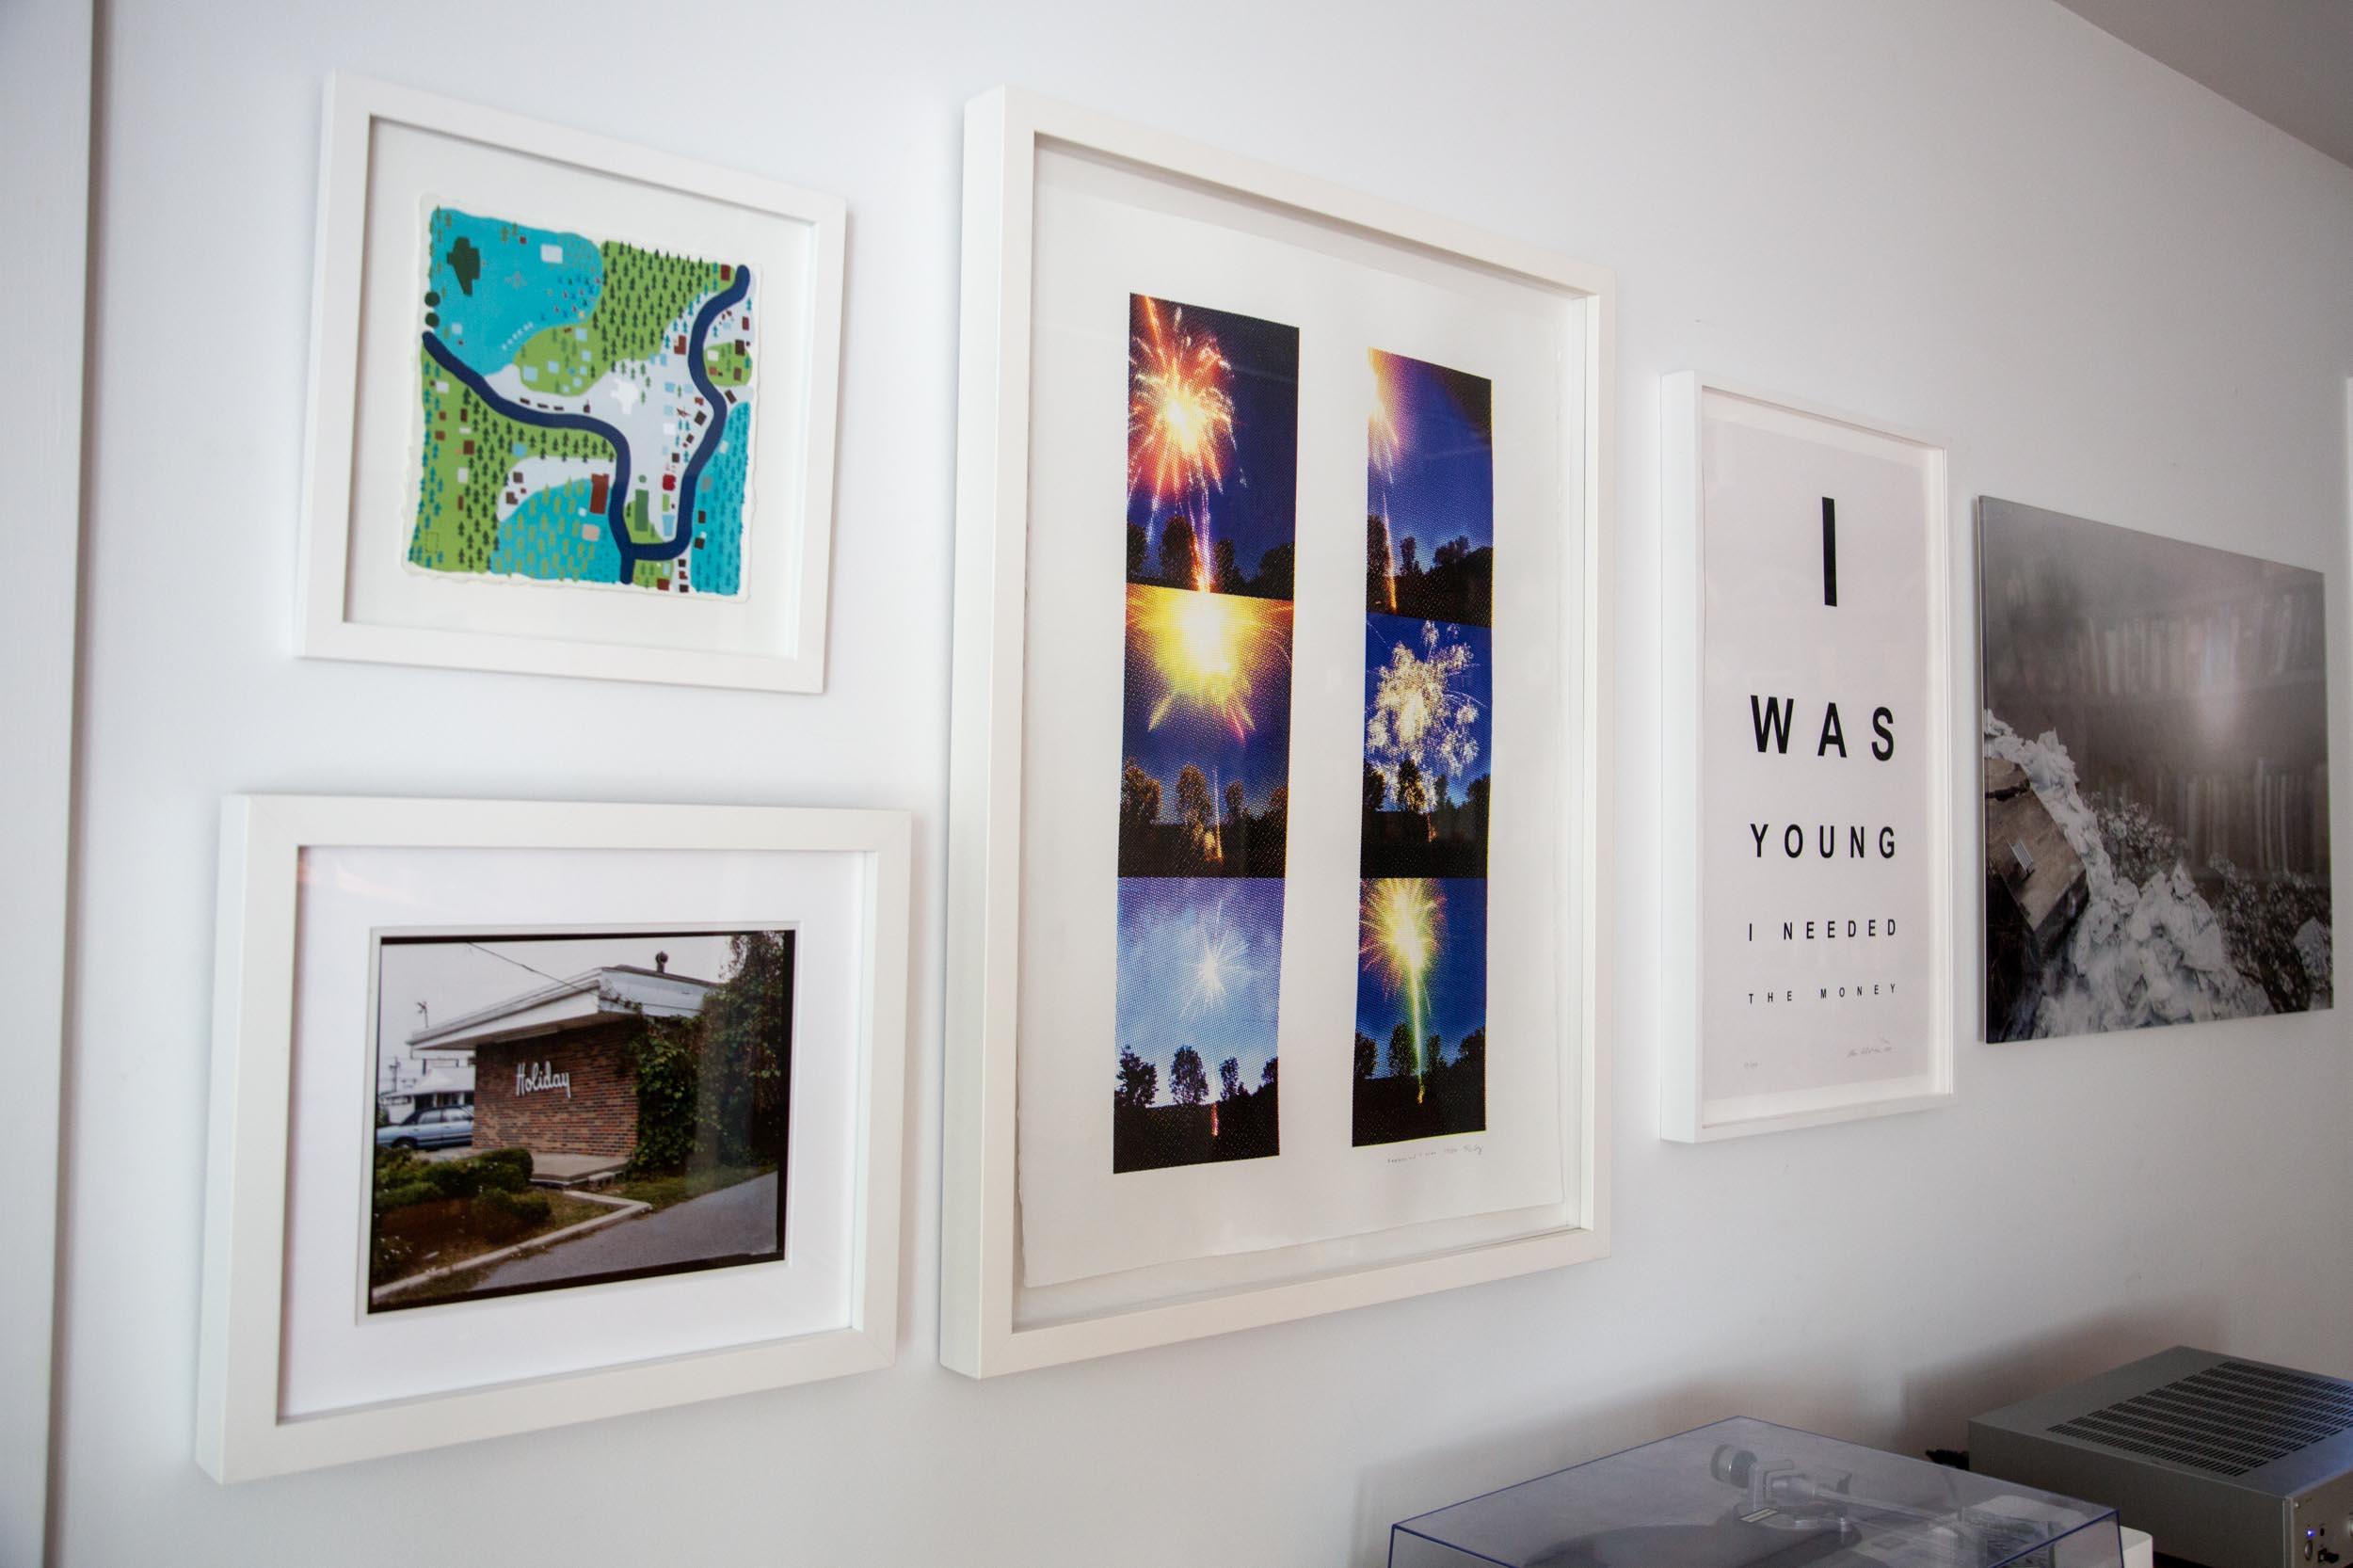 the-wassaic-project-director-bowie-zunino-2017-08-16-10-48-19.jpg